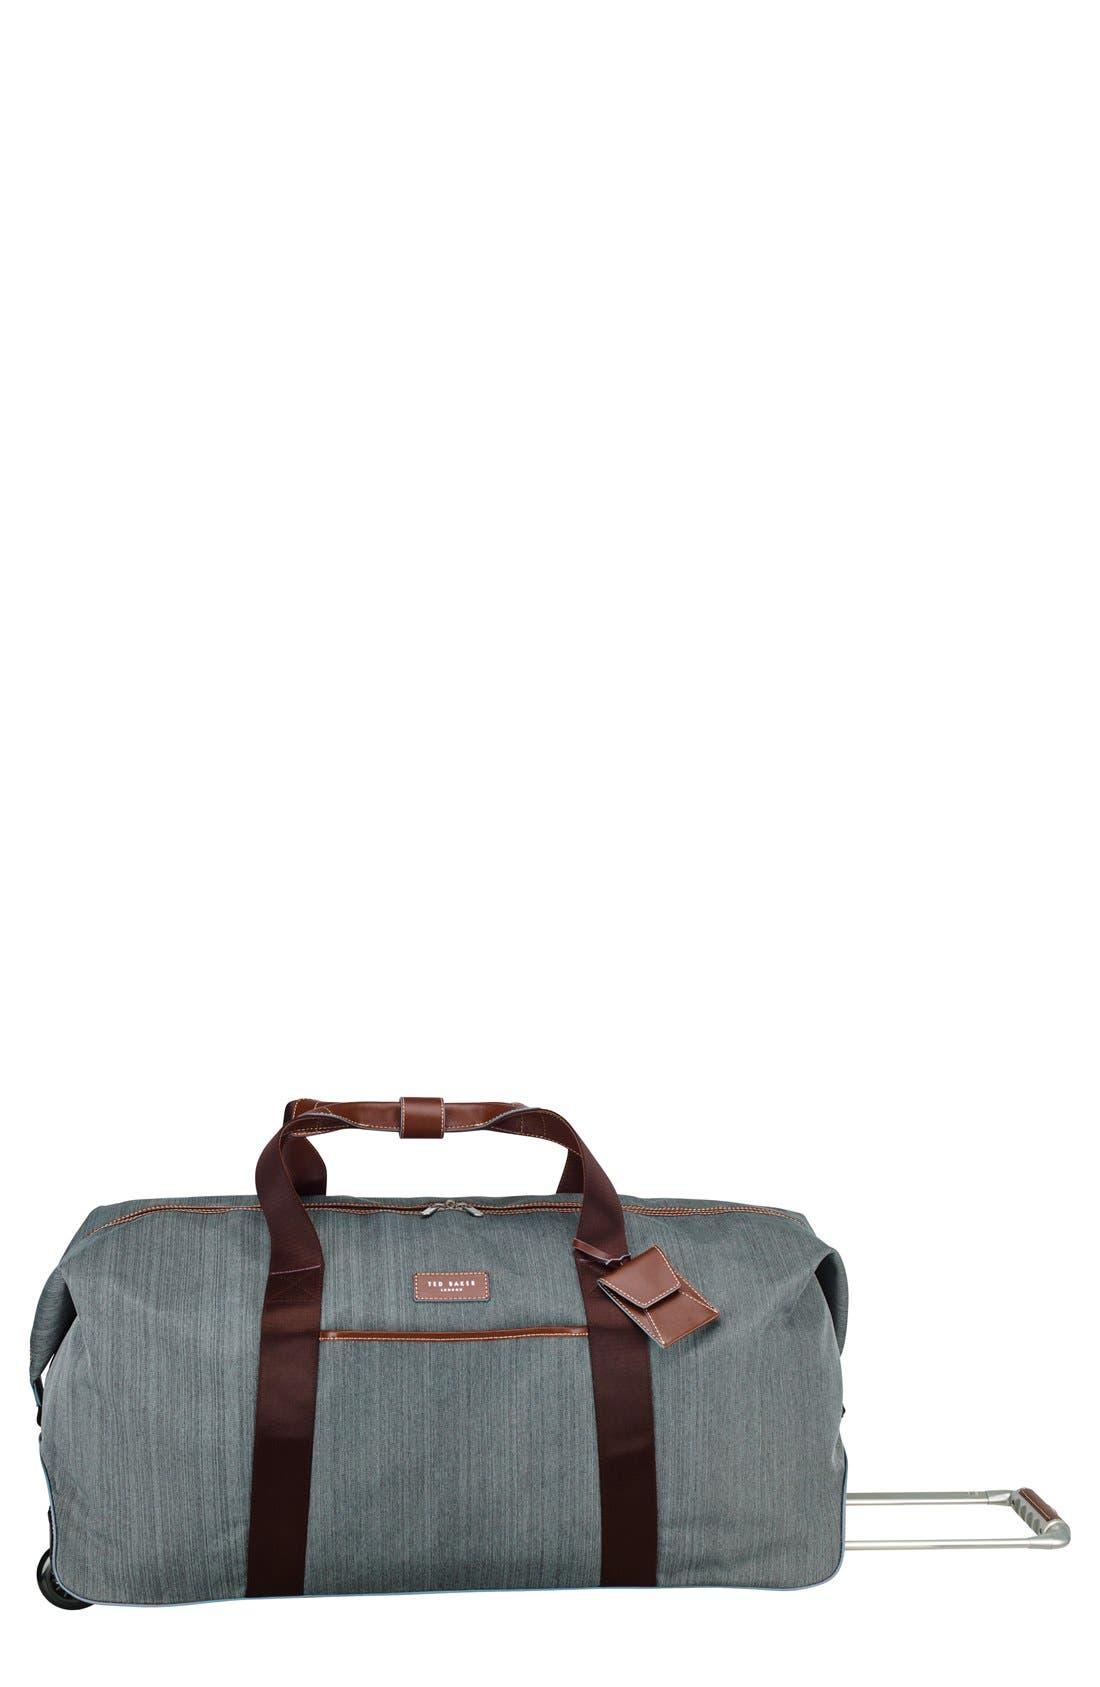 TED BAKER LONDON Large Falconwood Grey Rolling Duffel Bag